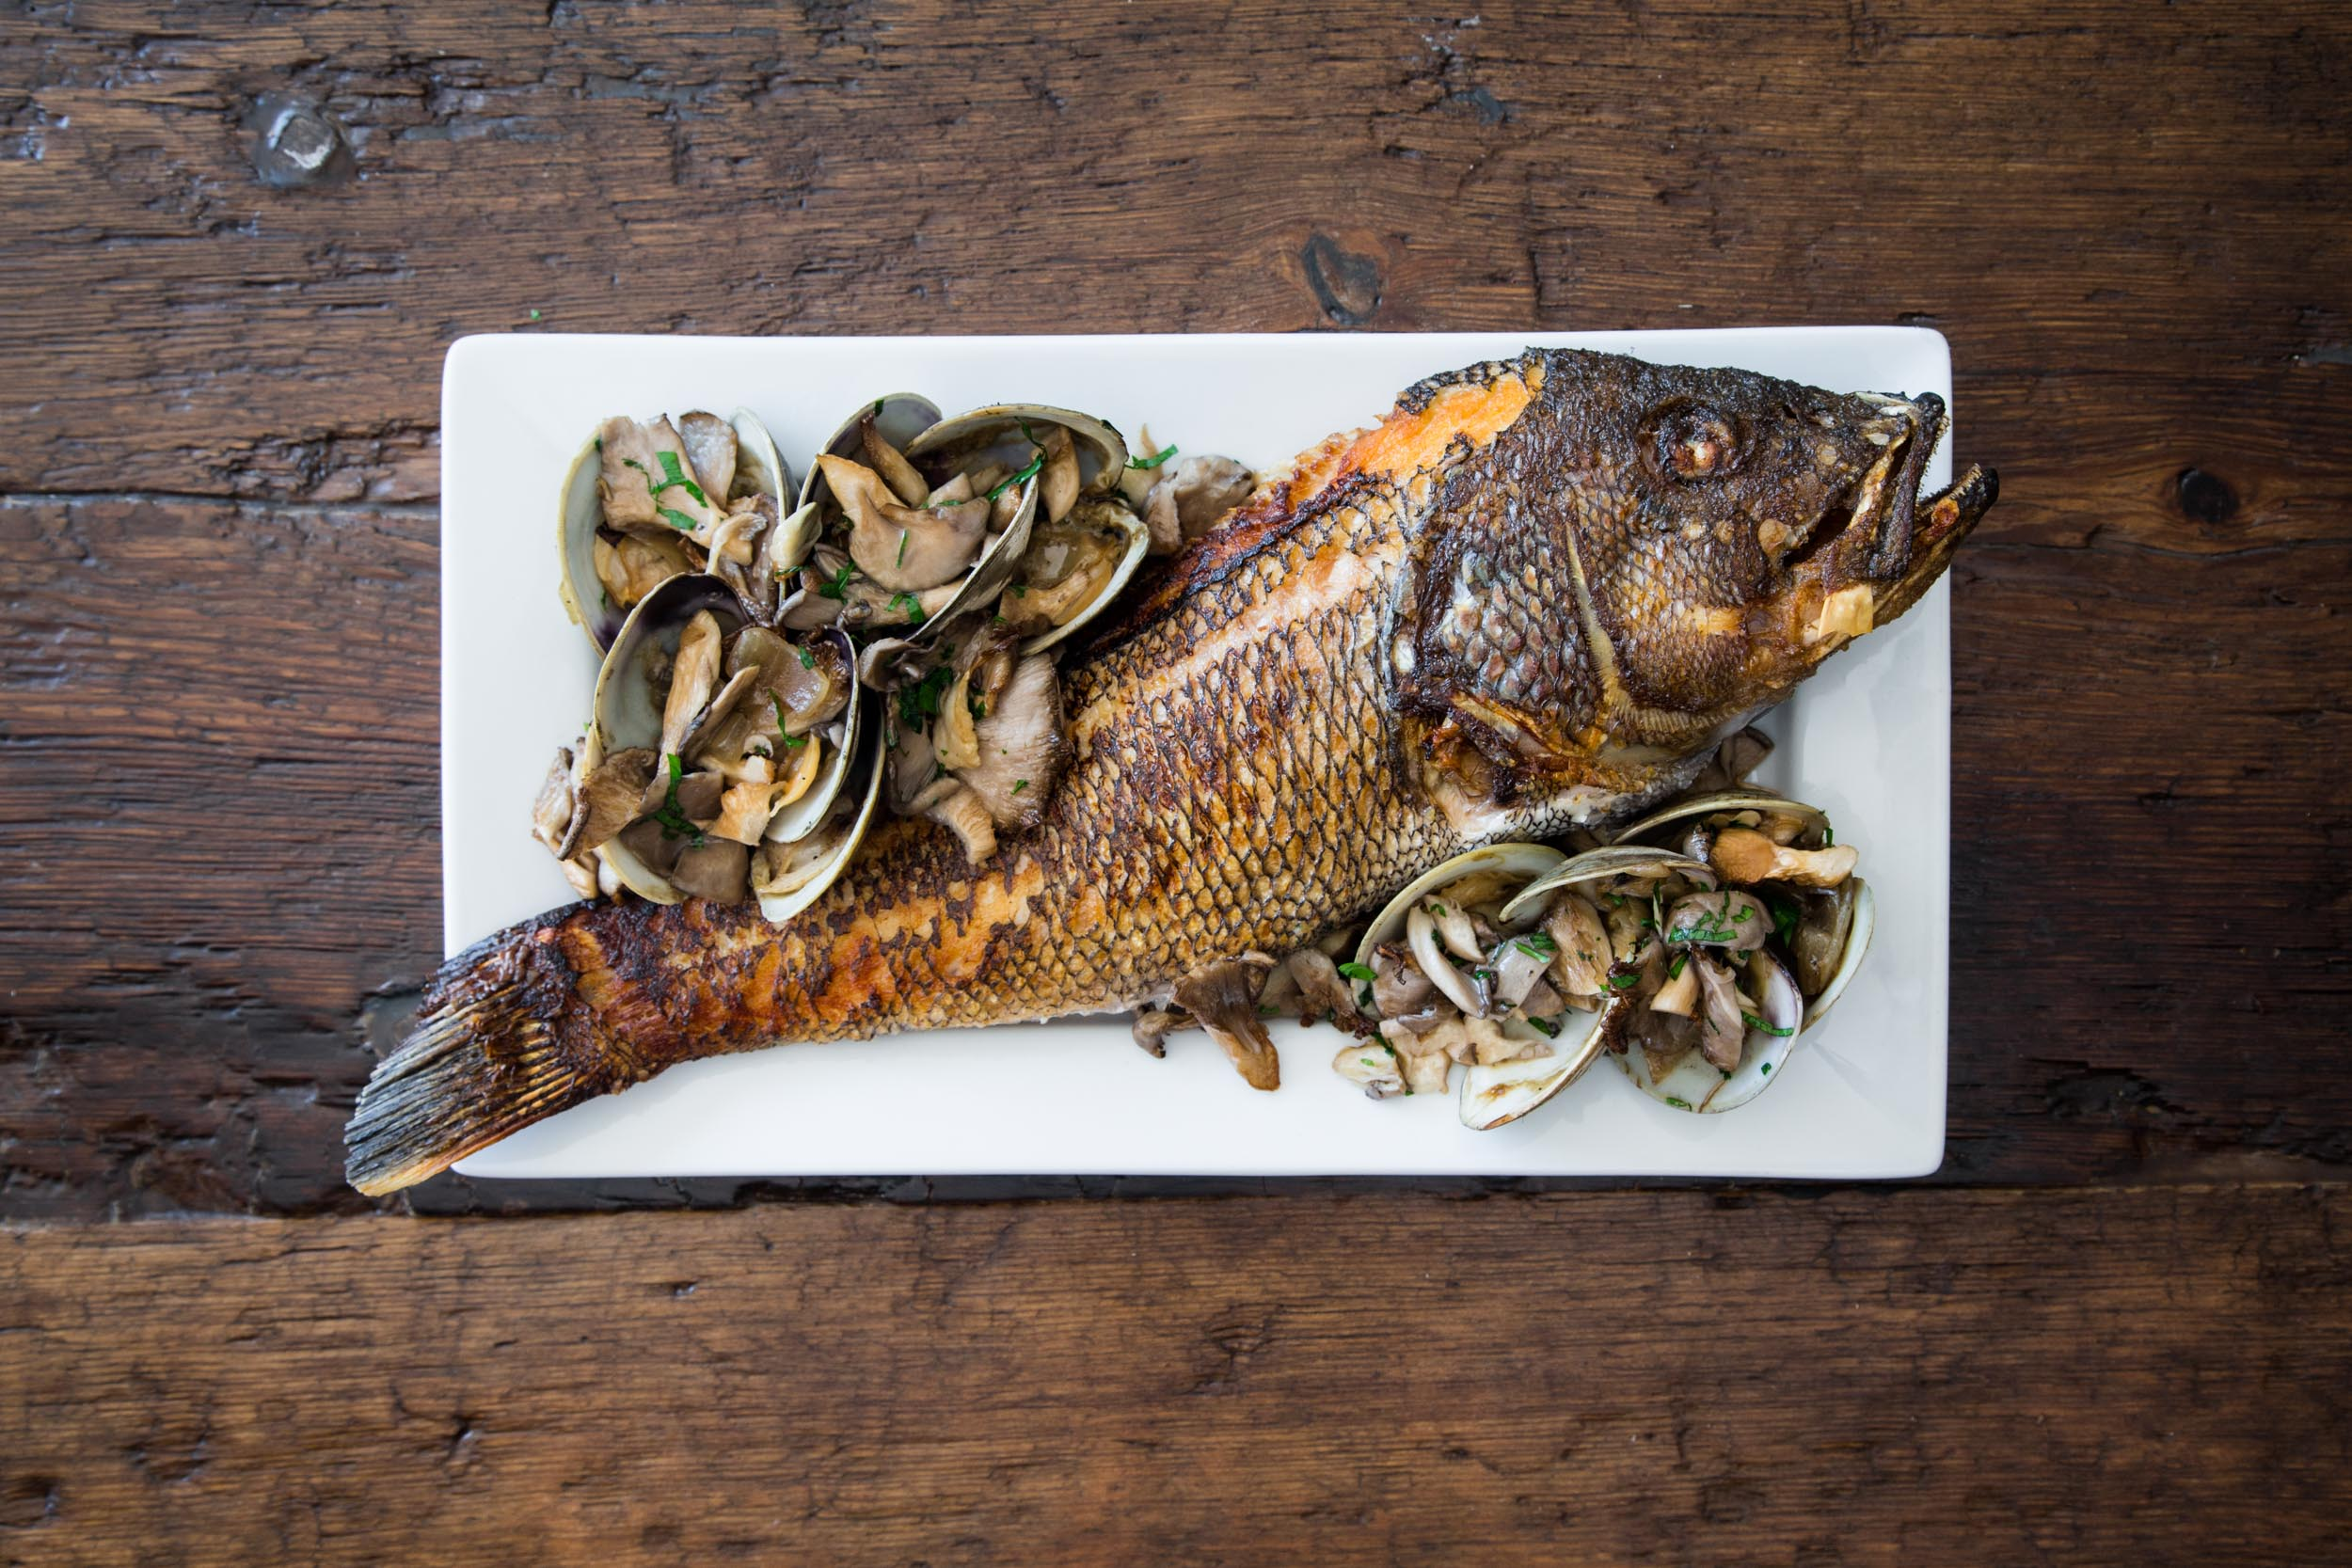 Crispy-Skin Striped Bass topped with a Leek, Wellfleet Clam, Vermouth, and Wild Mushroom Sauce